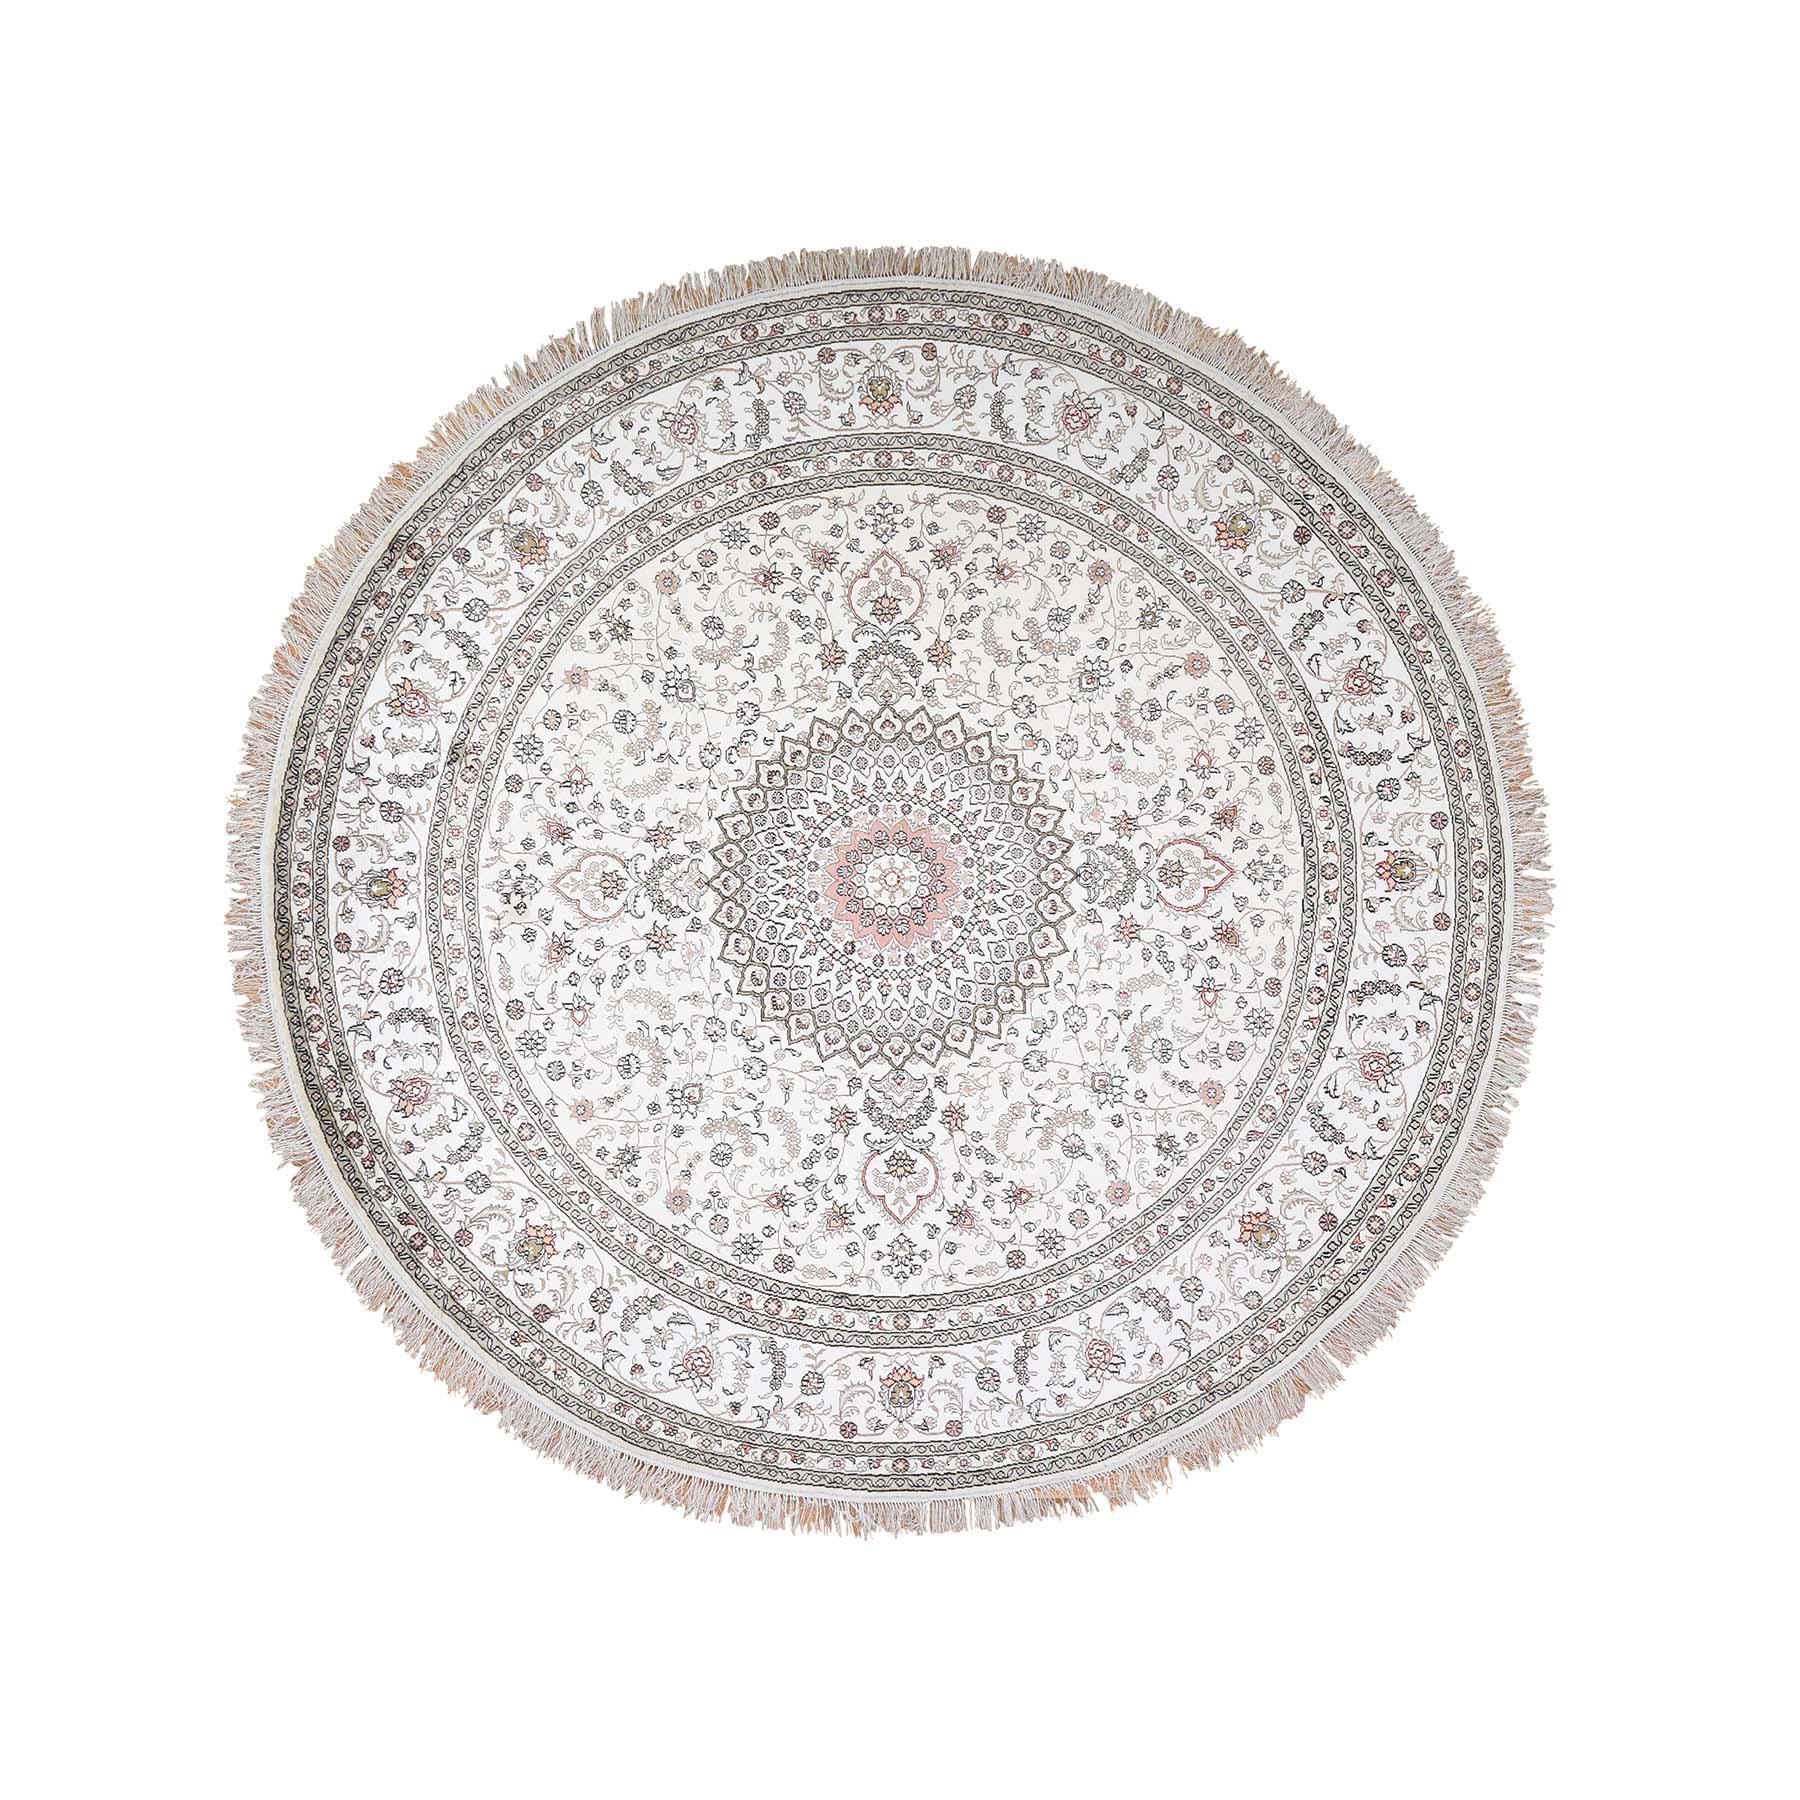 "9'1""x9'1"" Round Silken Esfahan 250 kpsi Ivory Hand Knotted Oriental Rug"